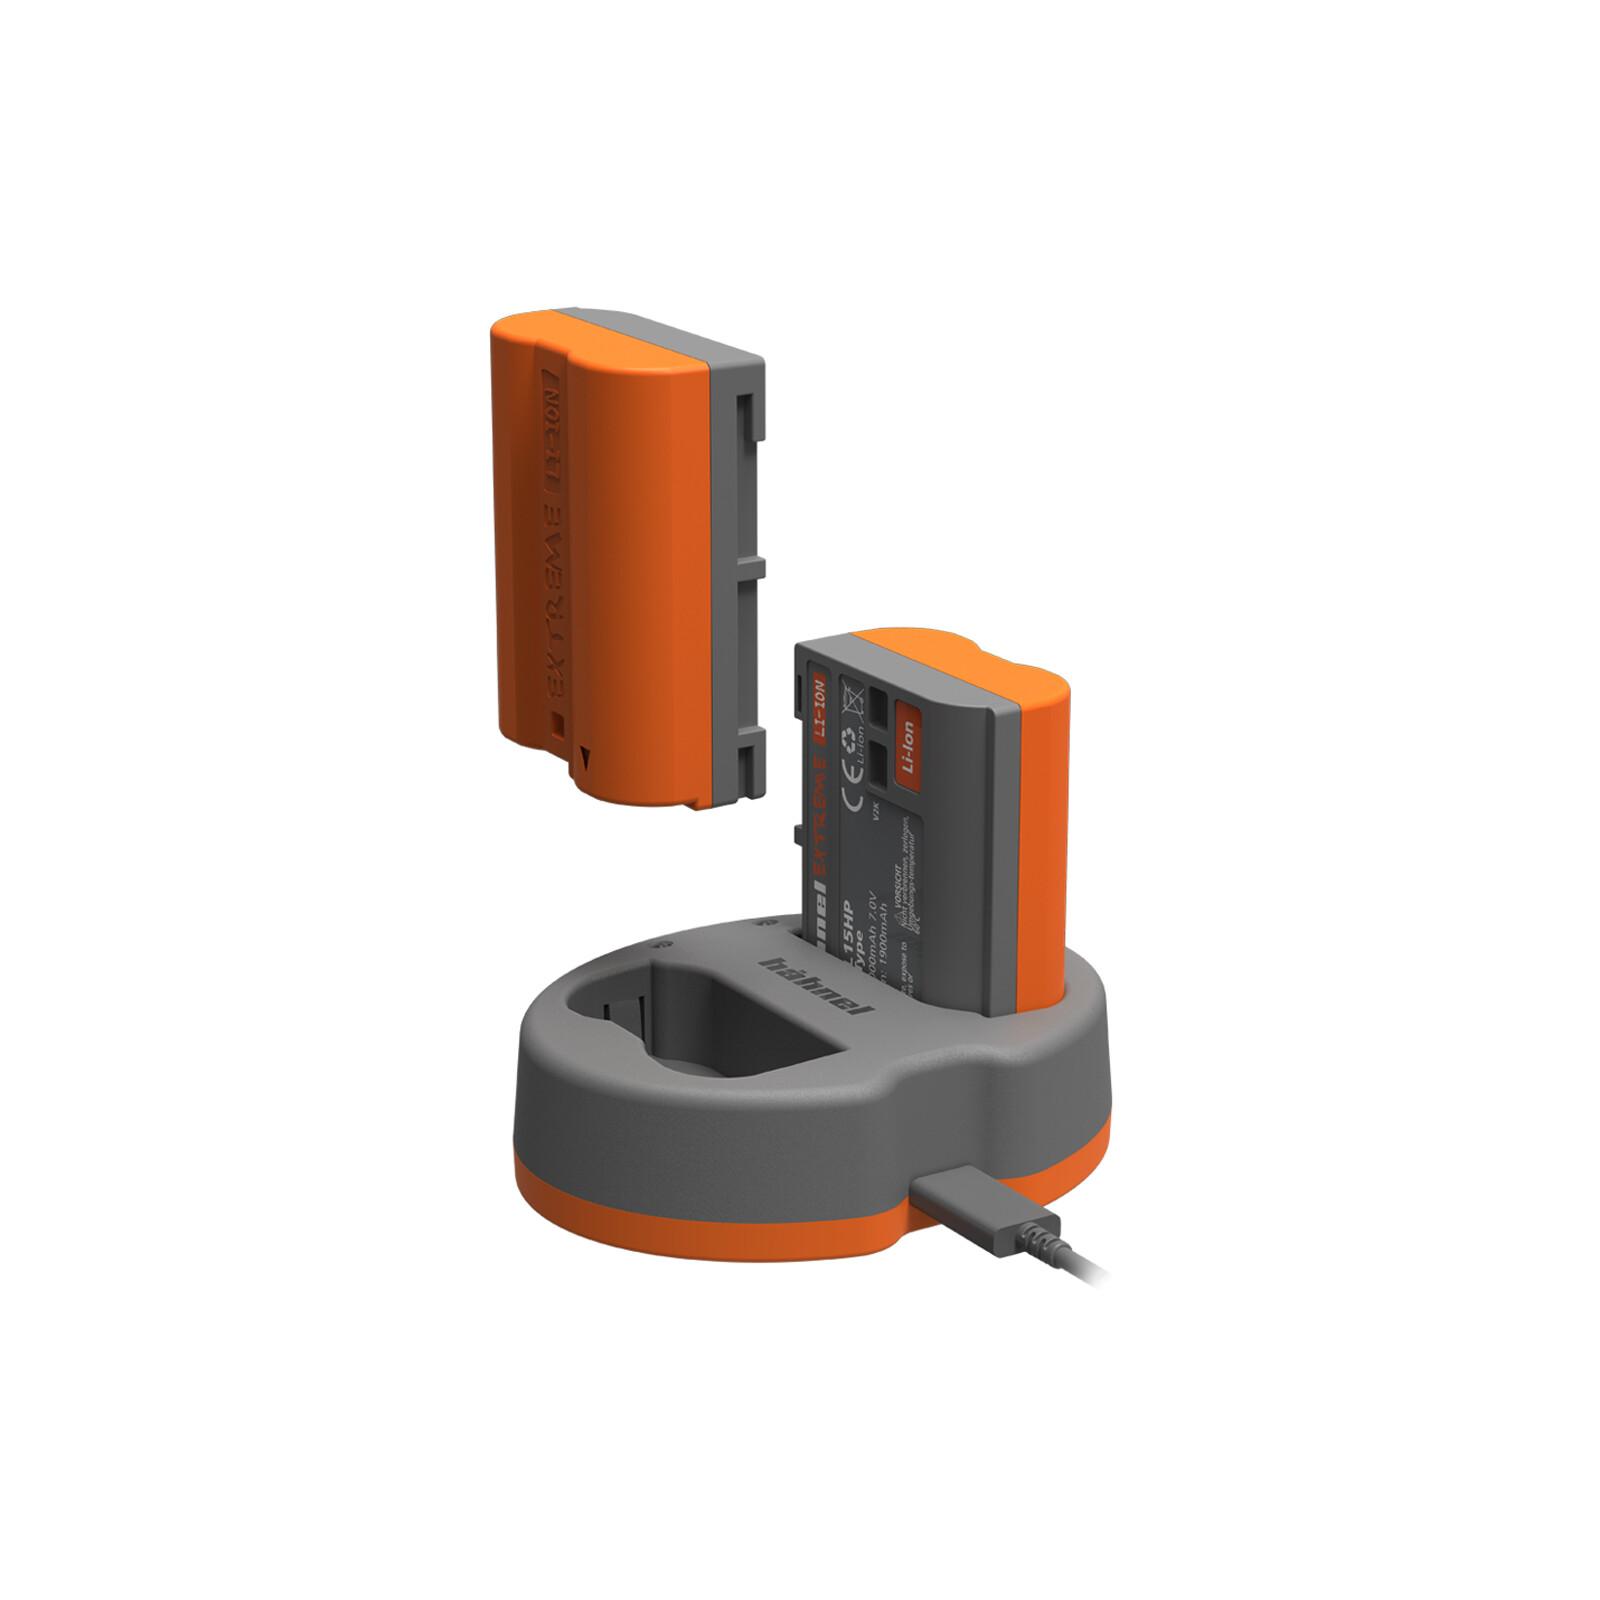 Hähnel XEL15HPKIT Doppelladegerät Canon XEL15HP